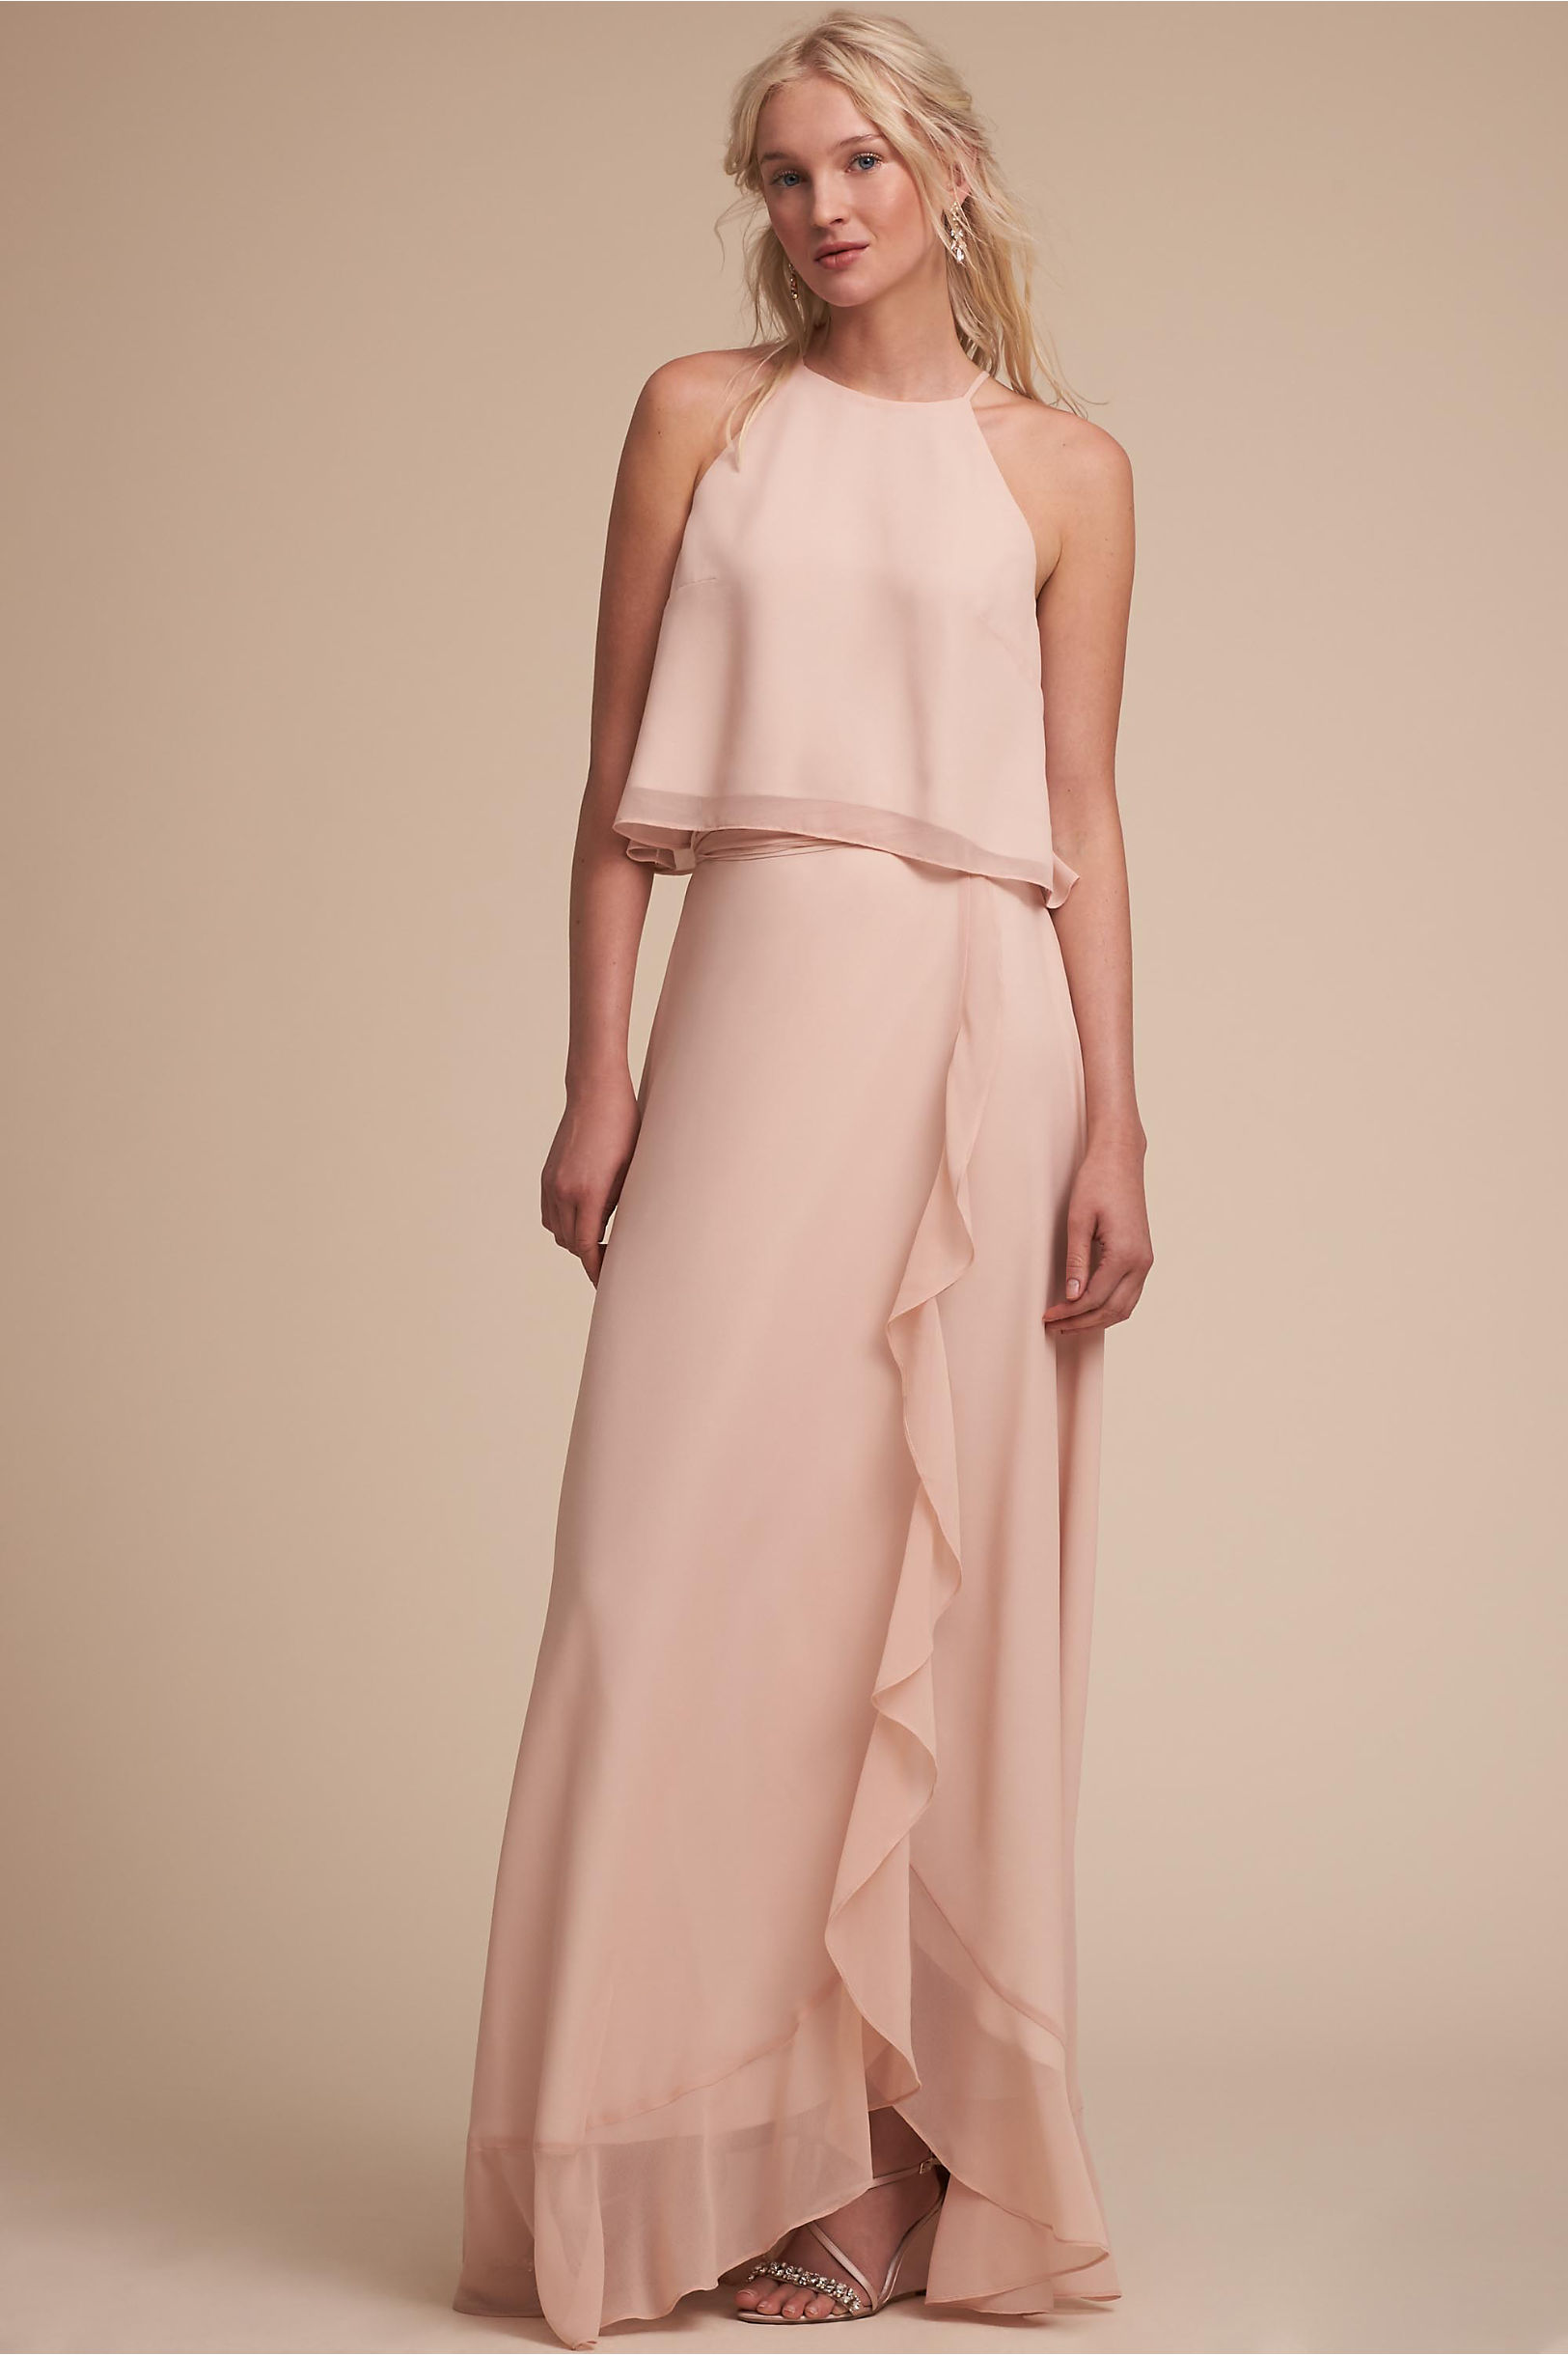 Two piece bridesmaid dresses separates bhldn etoile top skirt ombrellifo Choice Image